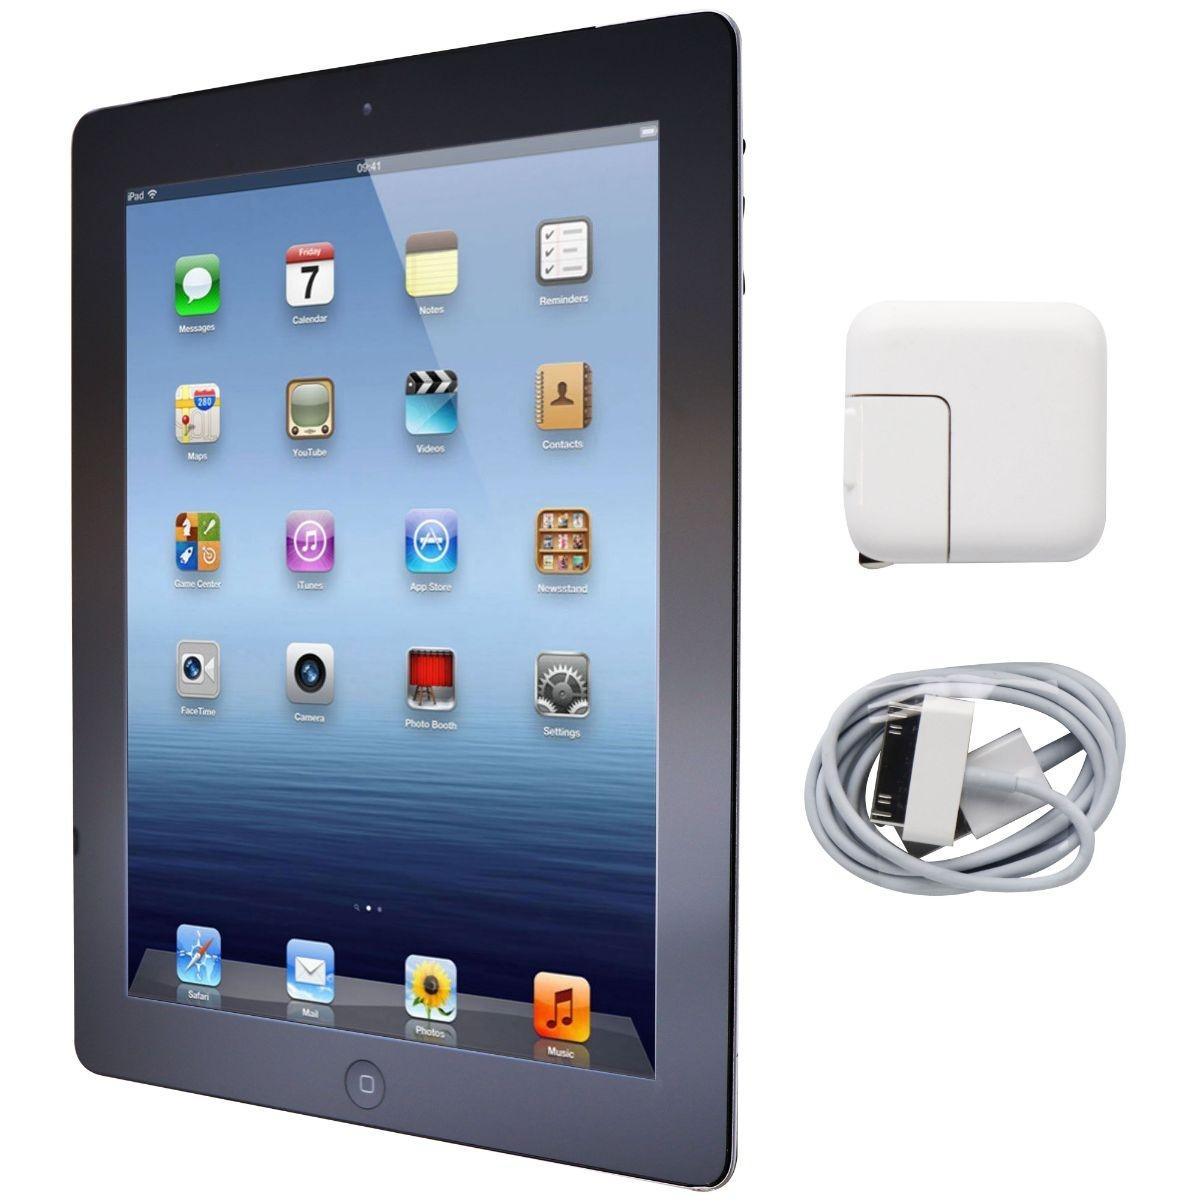 Apple iPad 9.7-inch (2nd Generation) Tablet A1396 (GSM Unlocked) - 64GB / Black